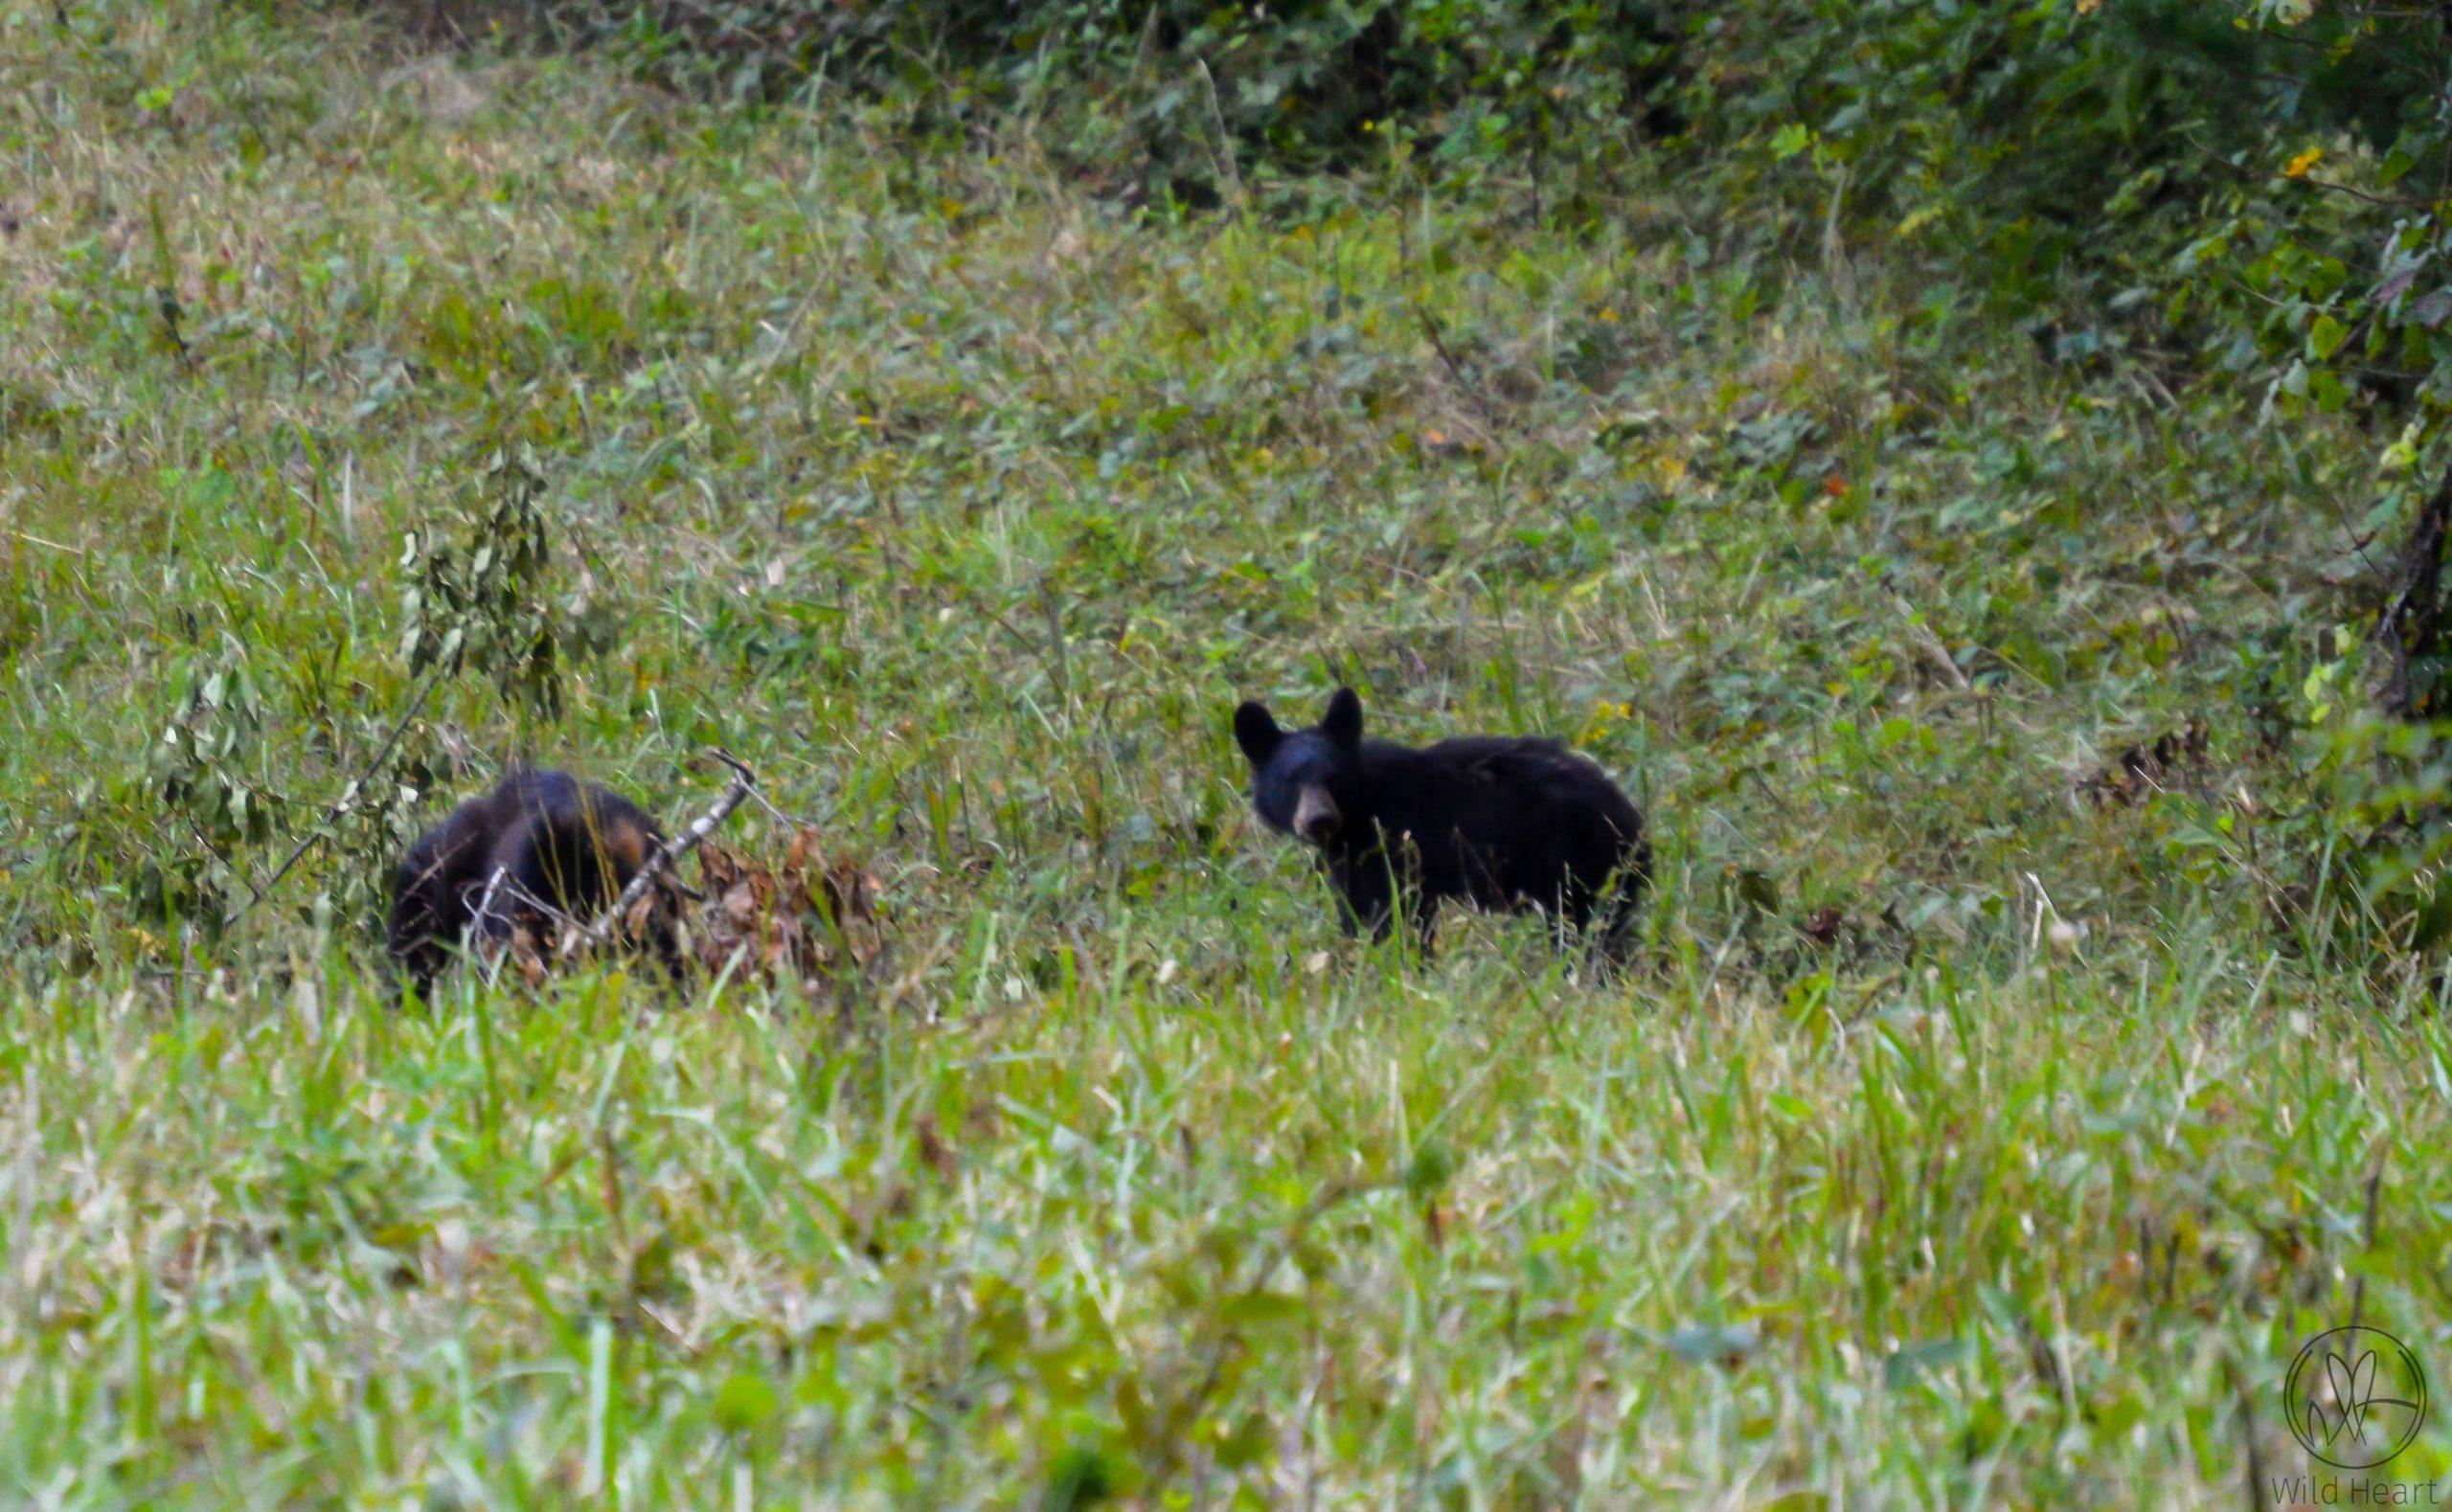 Black bears in East Tennessee